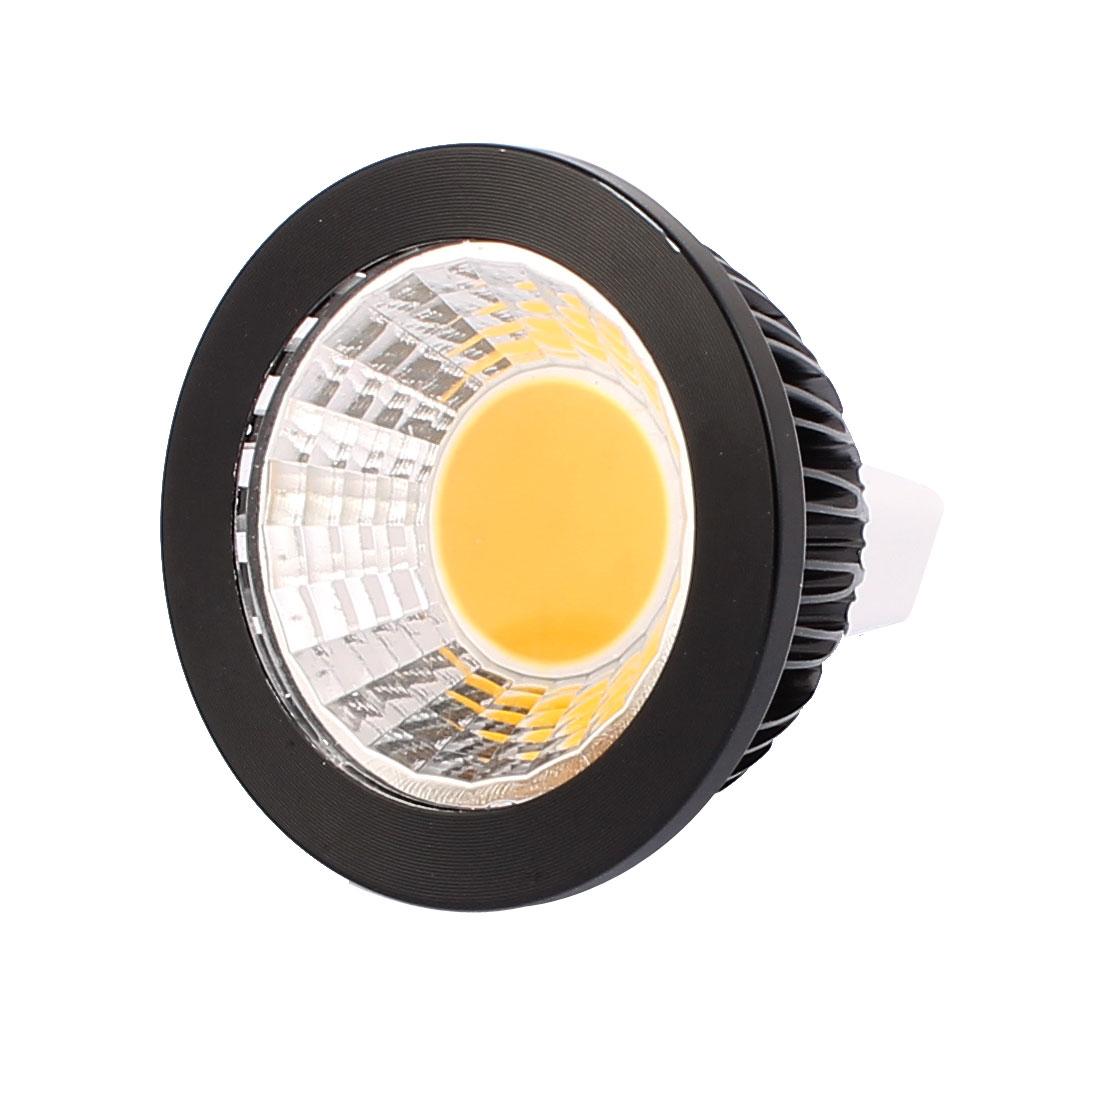 DC12V 3W MR16 COB LED Spotlight Lamp Bulb Energy Saving Downlight Warm White